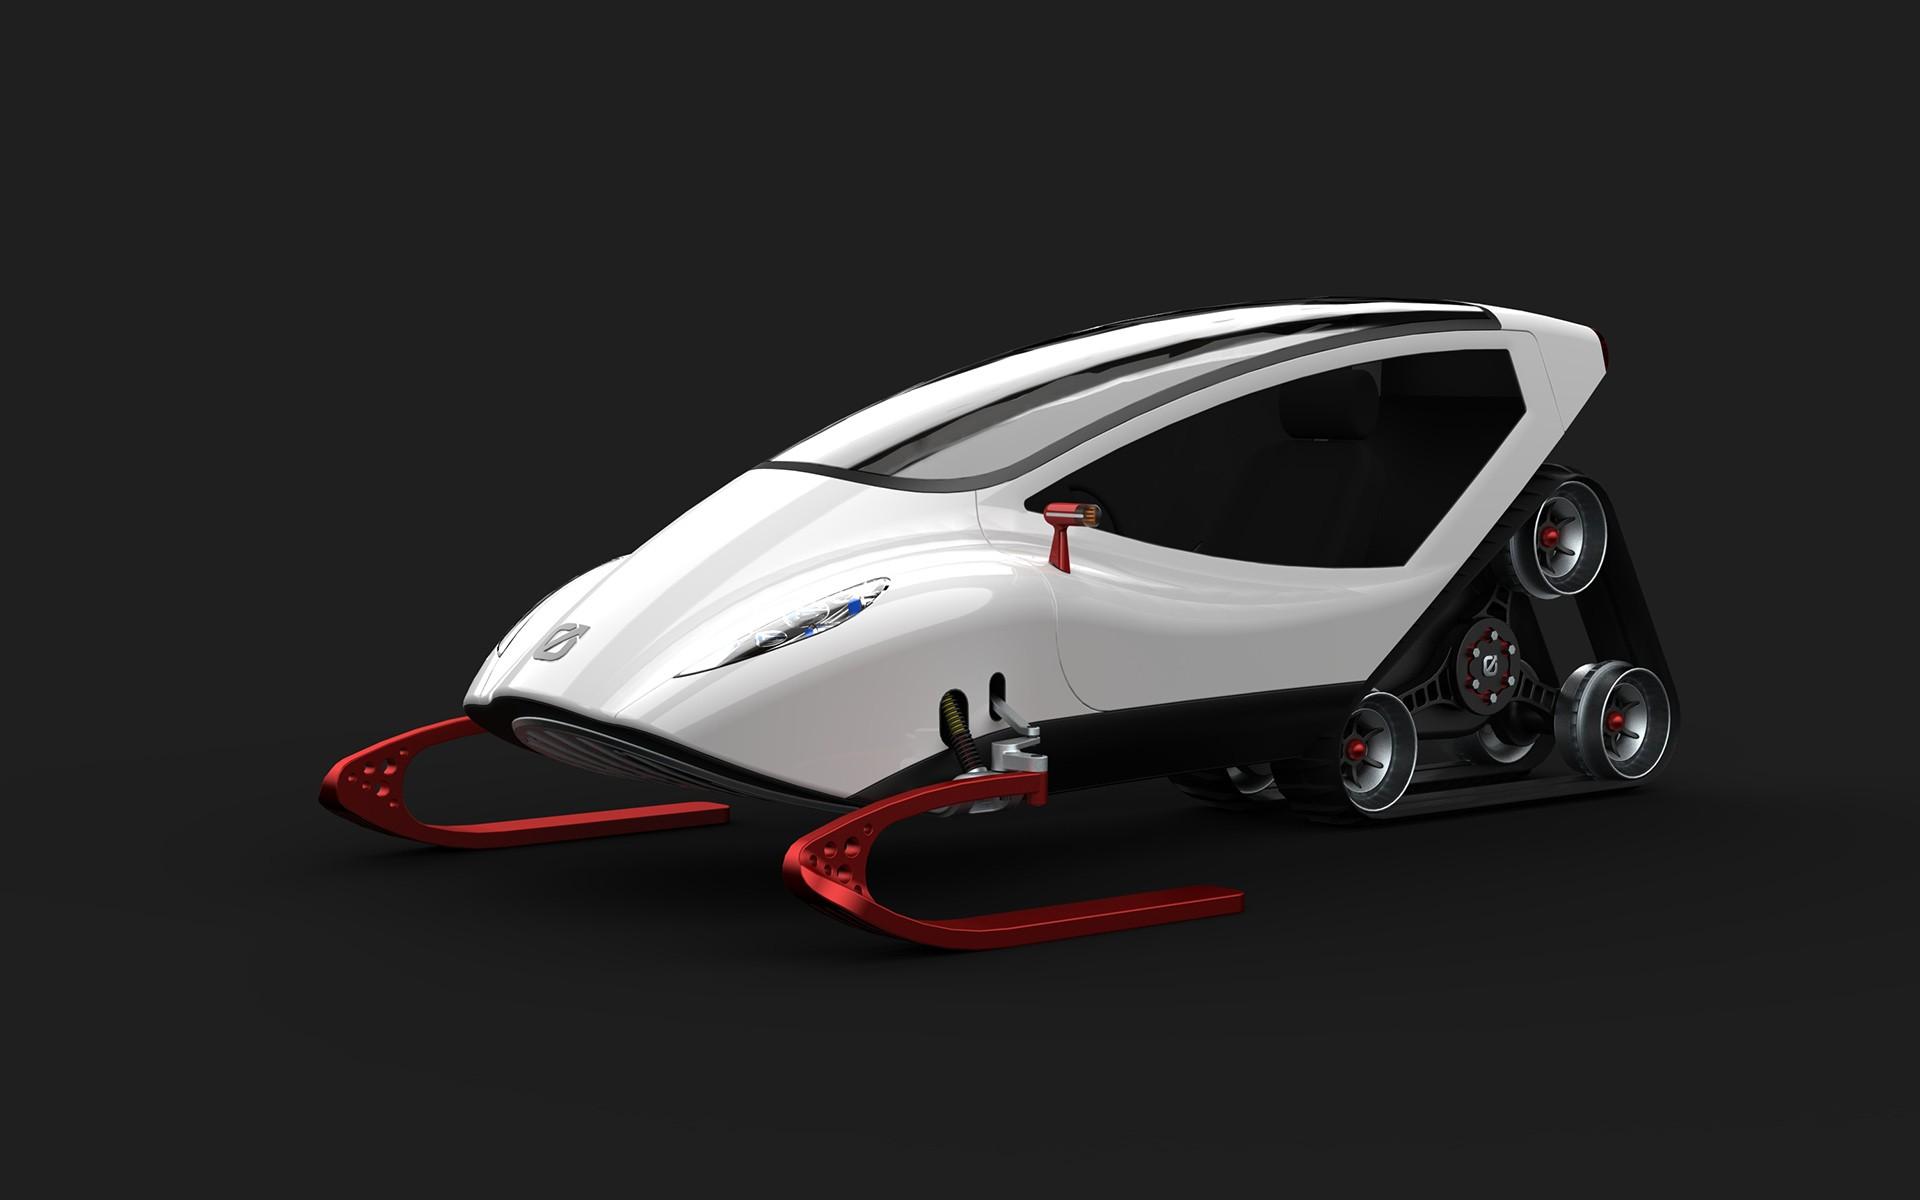 snow crawler the koenigsegg of electric snowmobile concepts autoevolution. Black Bedroom Furniture Sets. Home Design Ideas